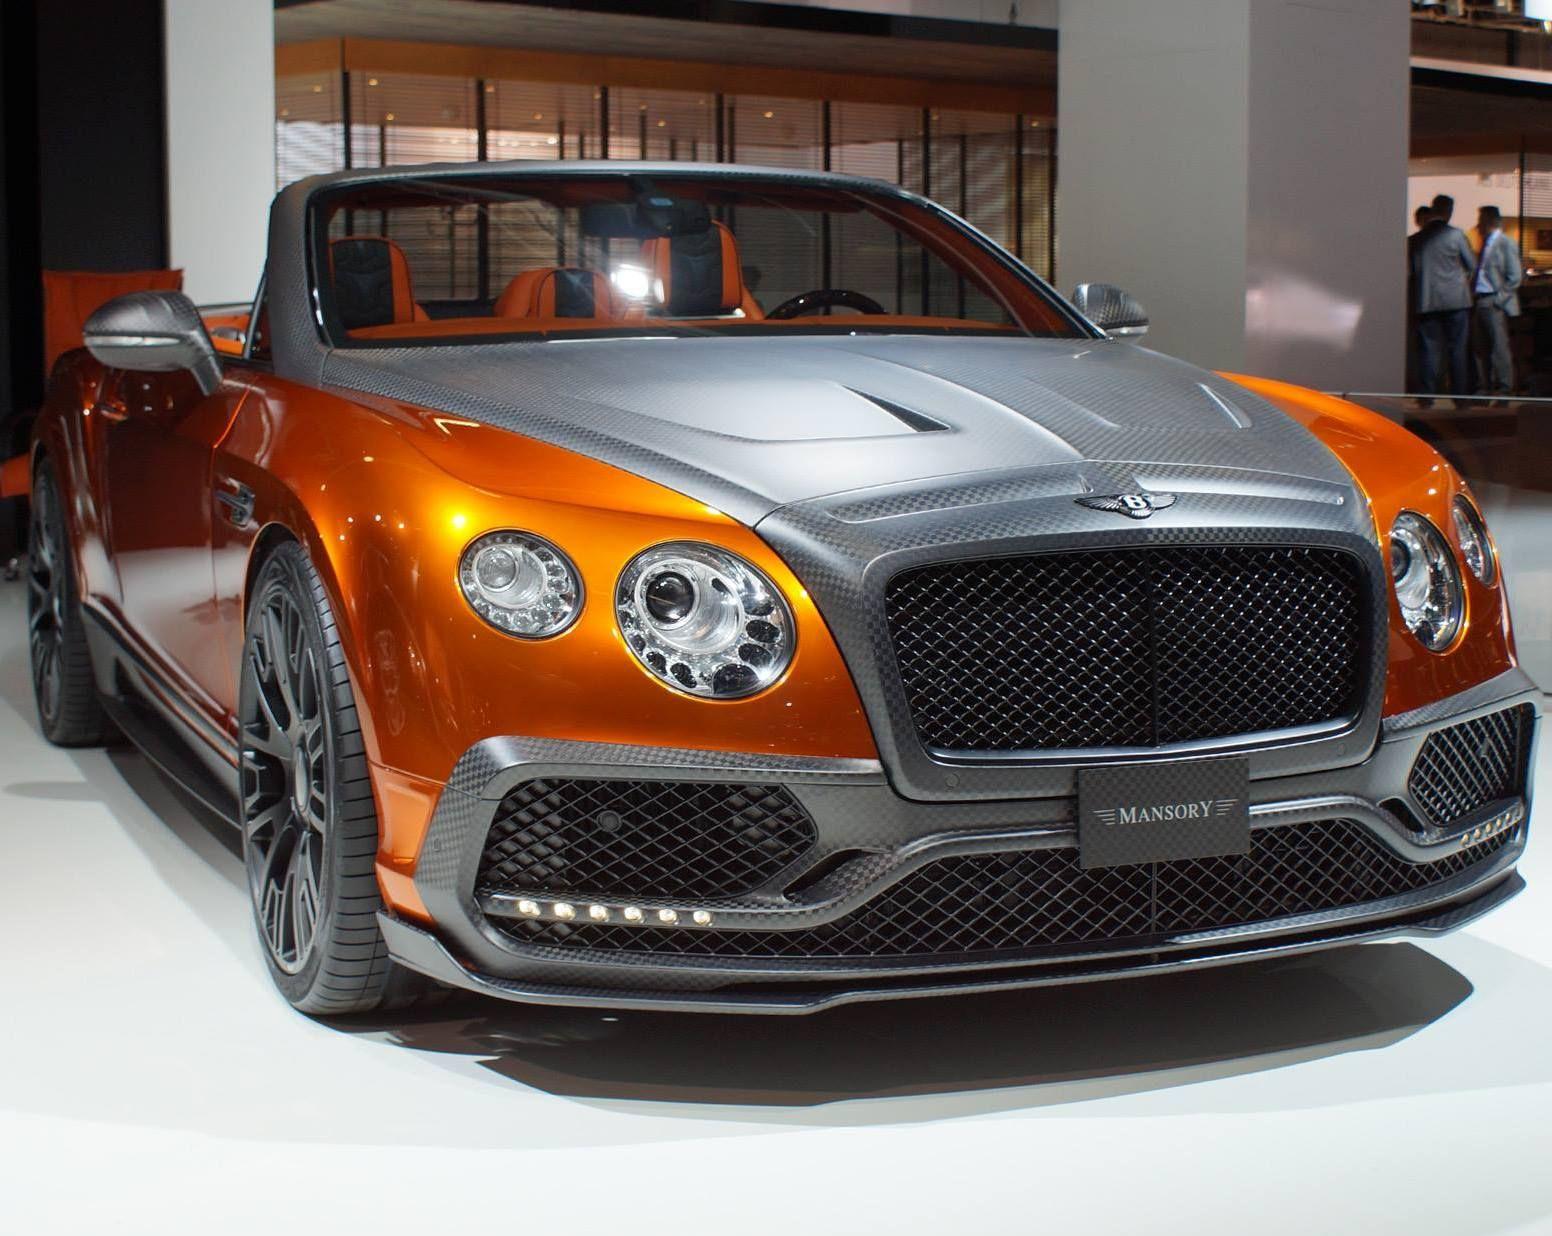 Bentley Continental GTC Visit TuningCult.com For All